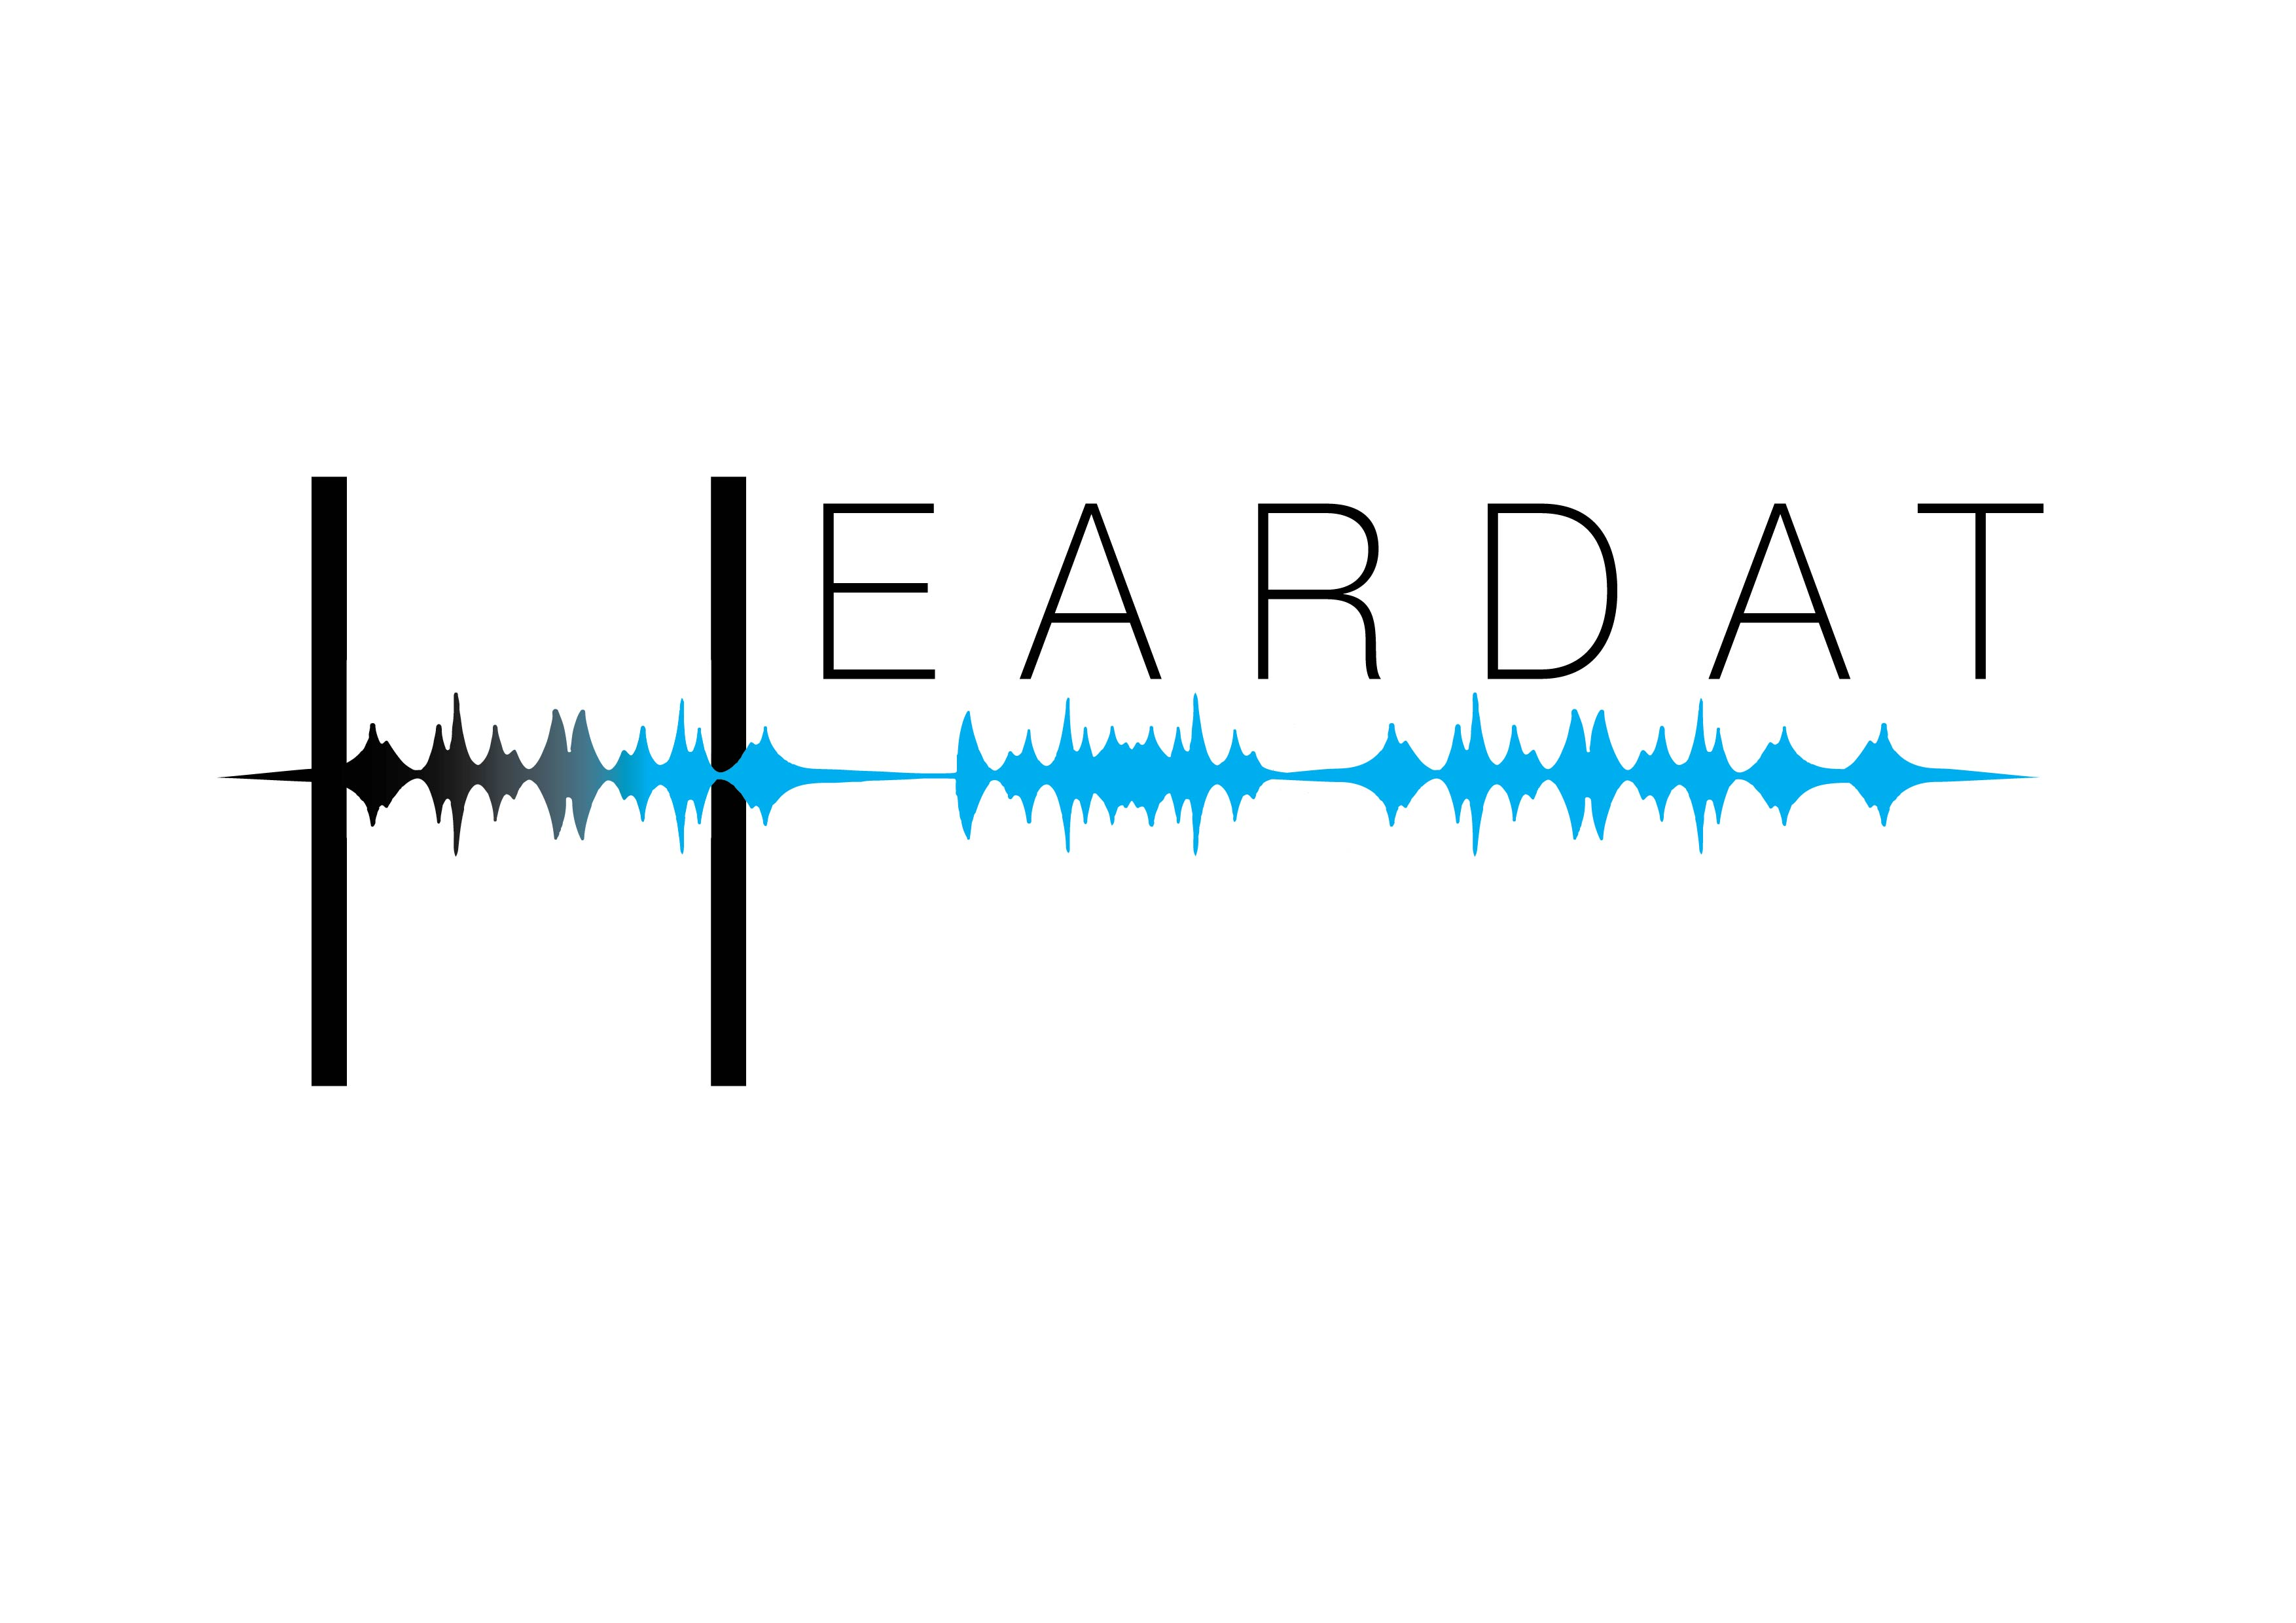 heardatLOGO-08-08